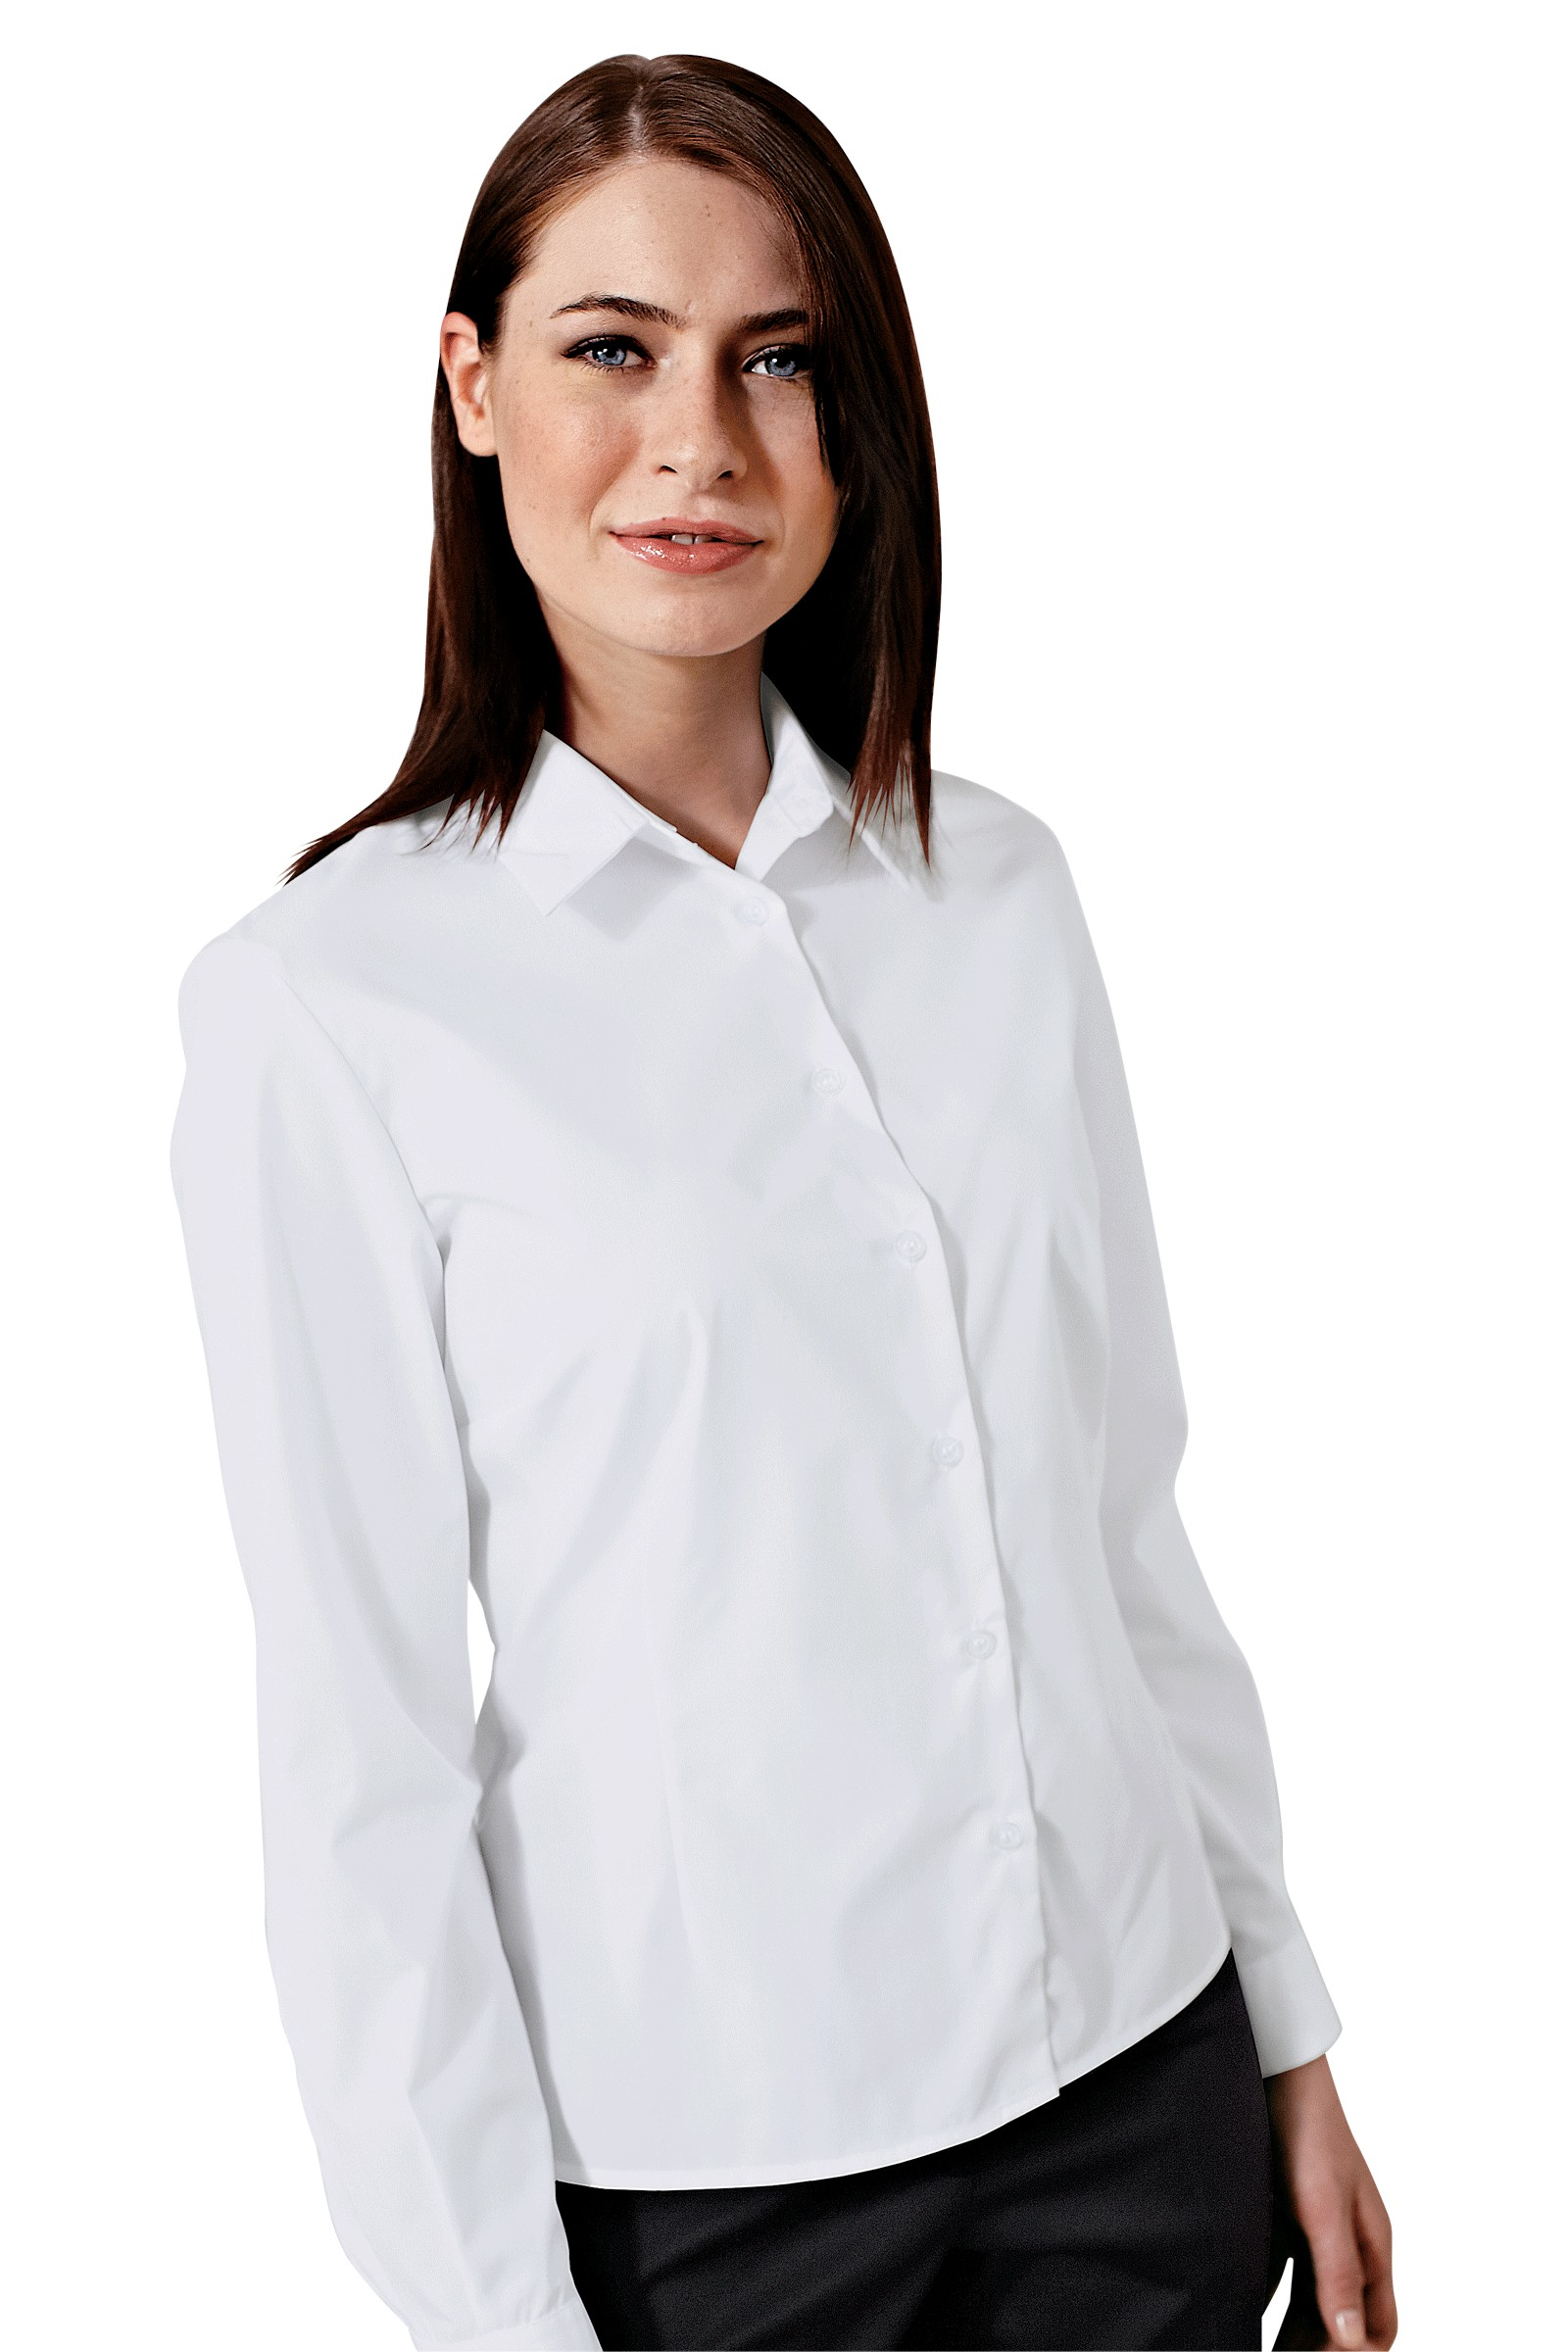 Favori Chemises service et hôtellerie - Bragard OT71